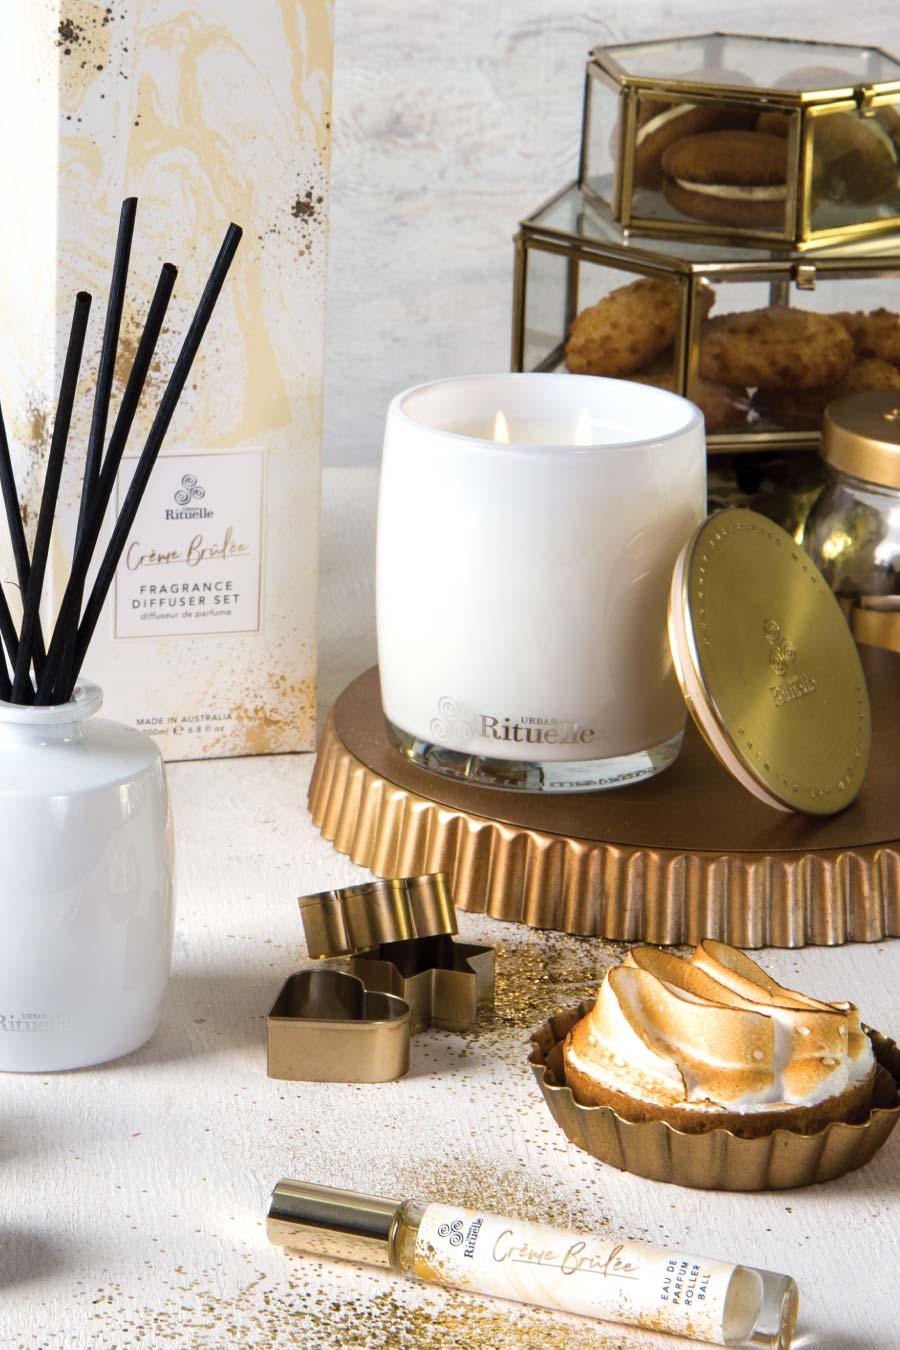 Sweet Treats Crème Brulee Fragrance Diffuser Set